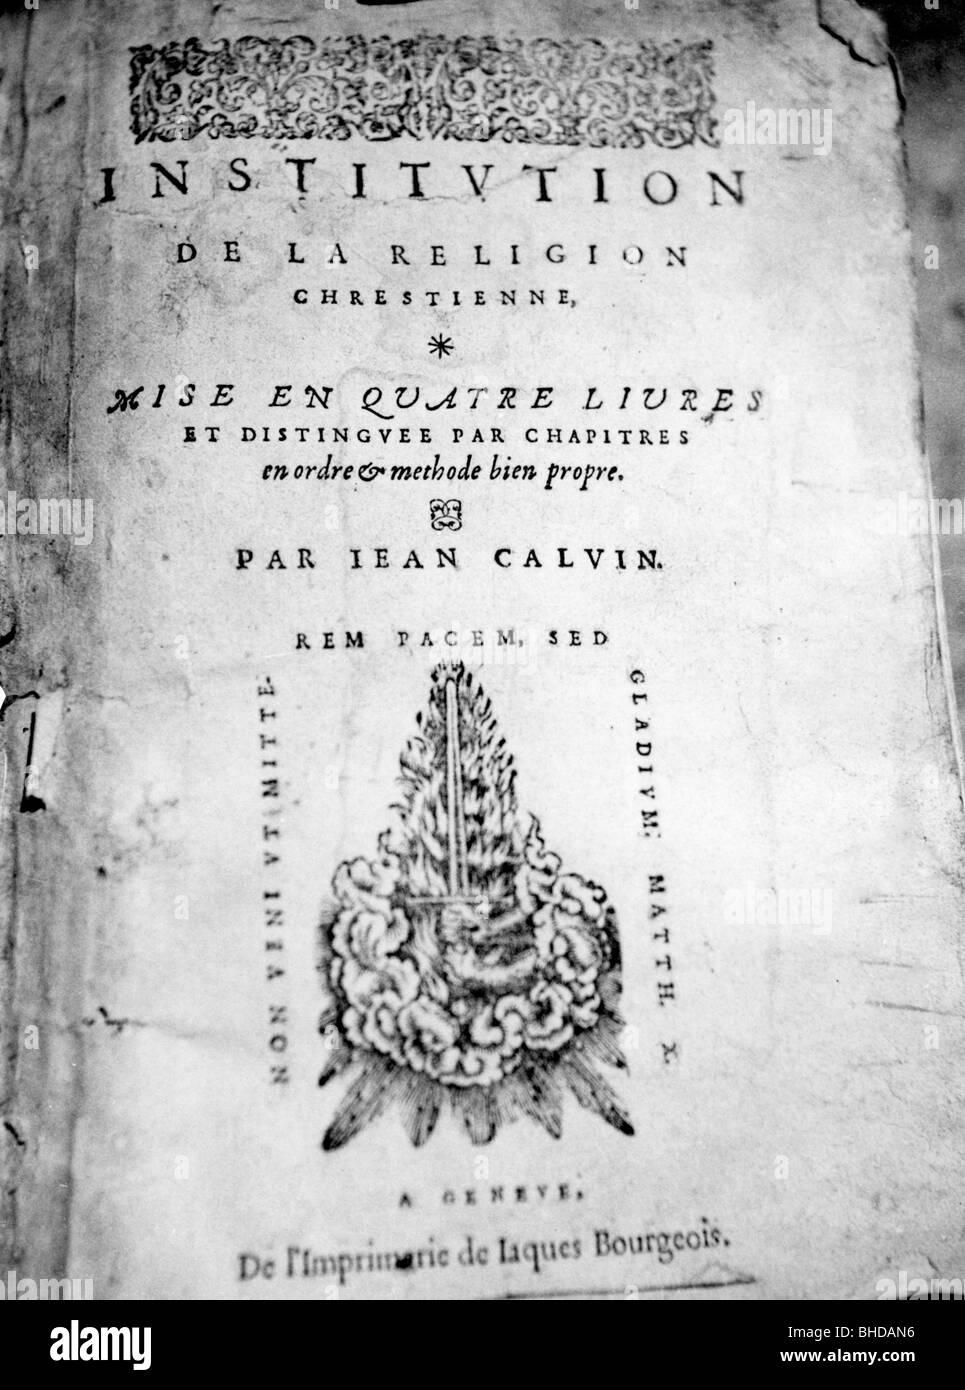 Calvin, John, 10.7.1509 - 27.5.1564, French clergyman and reformer, his script 'Institution de la religion chrestienne', - Stock Image